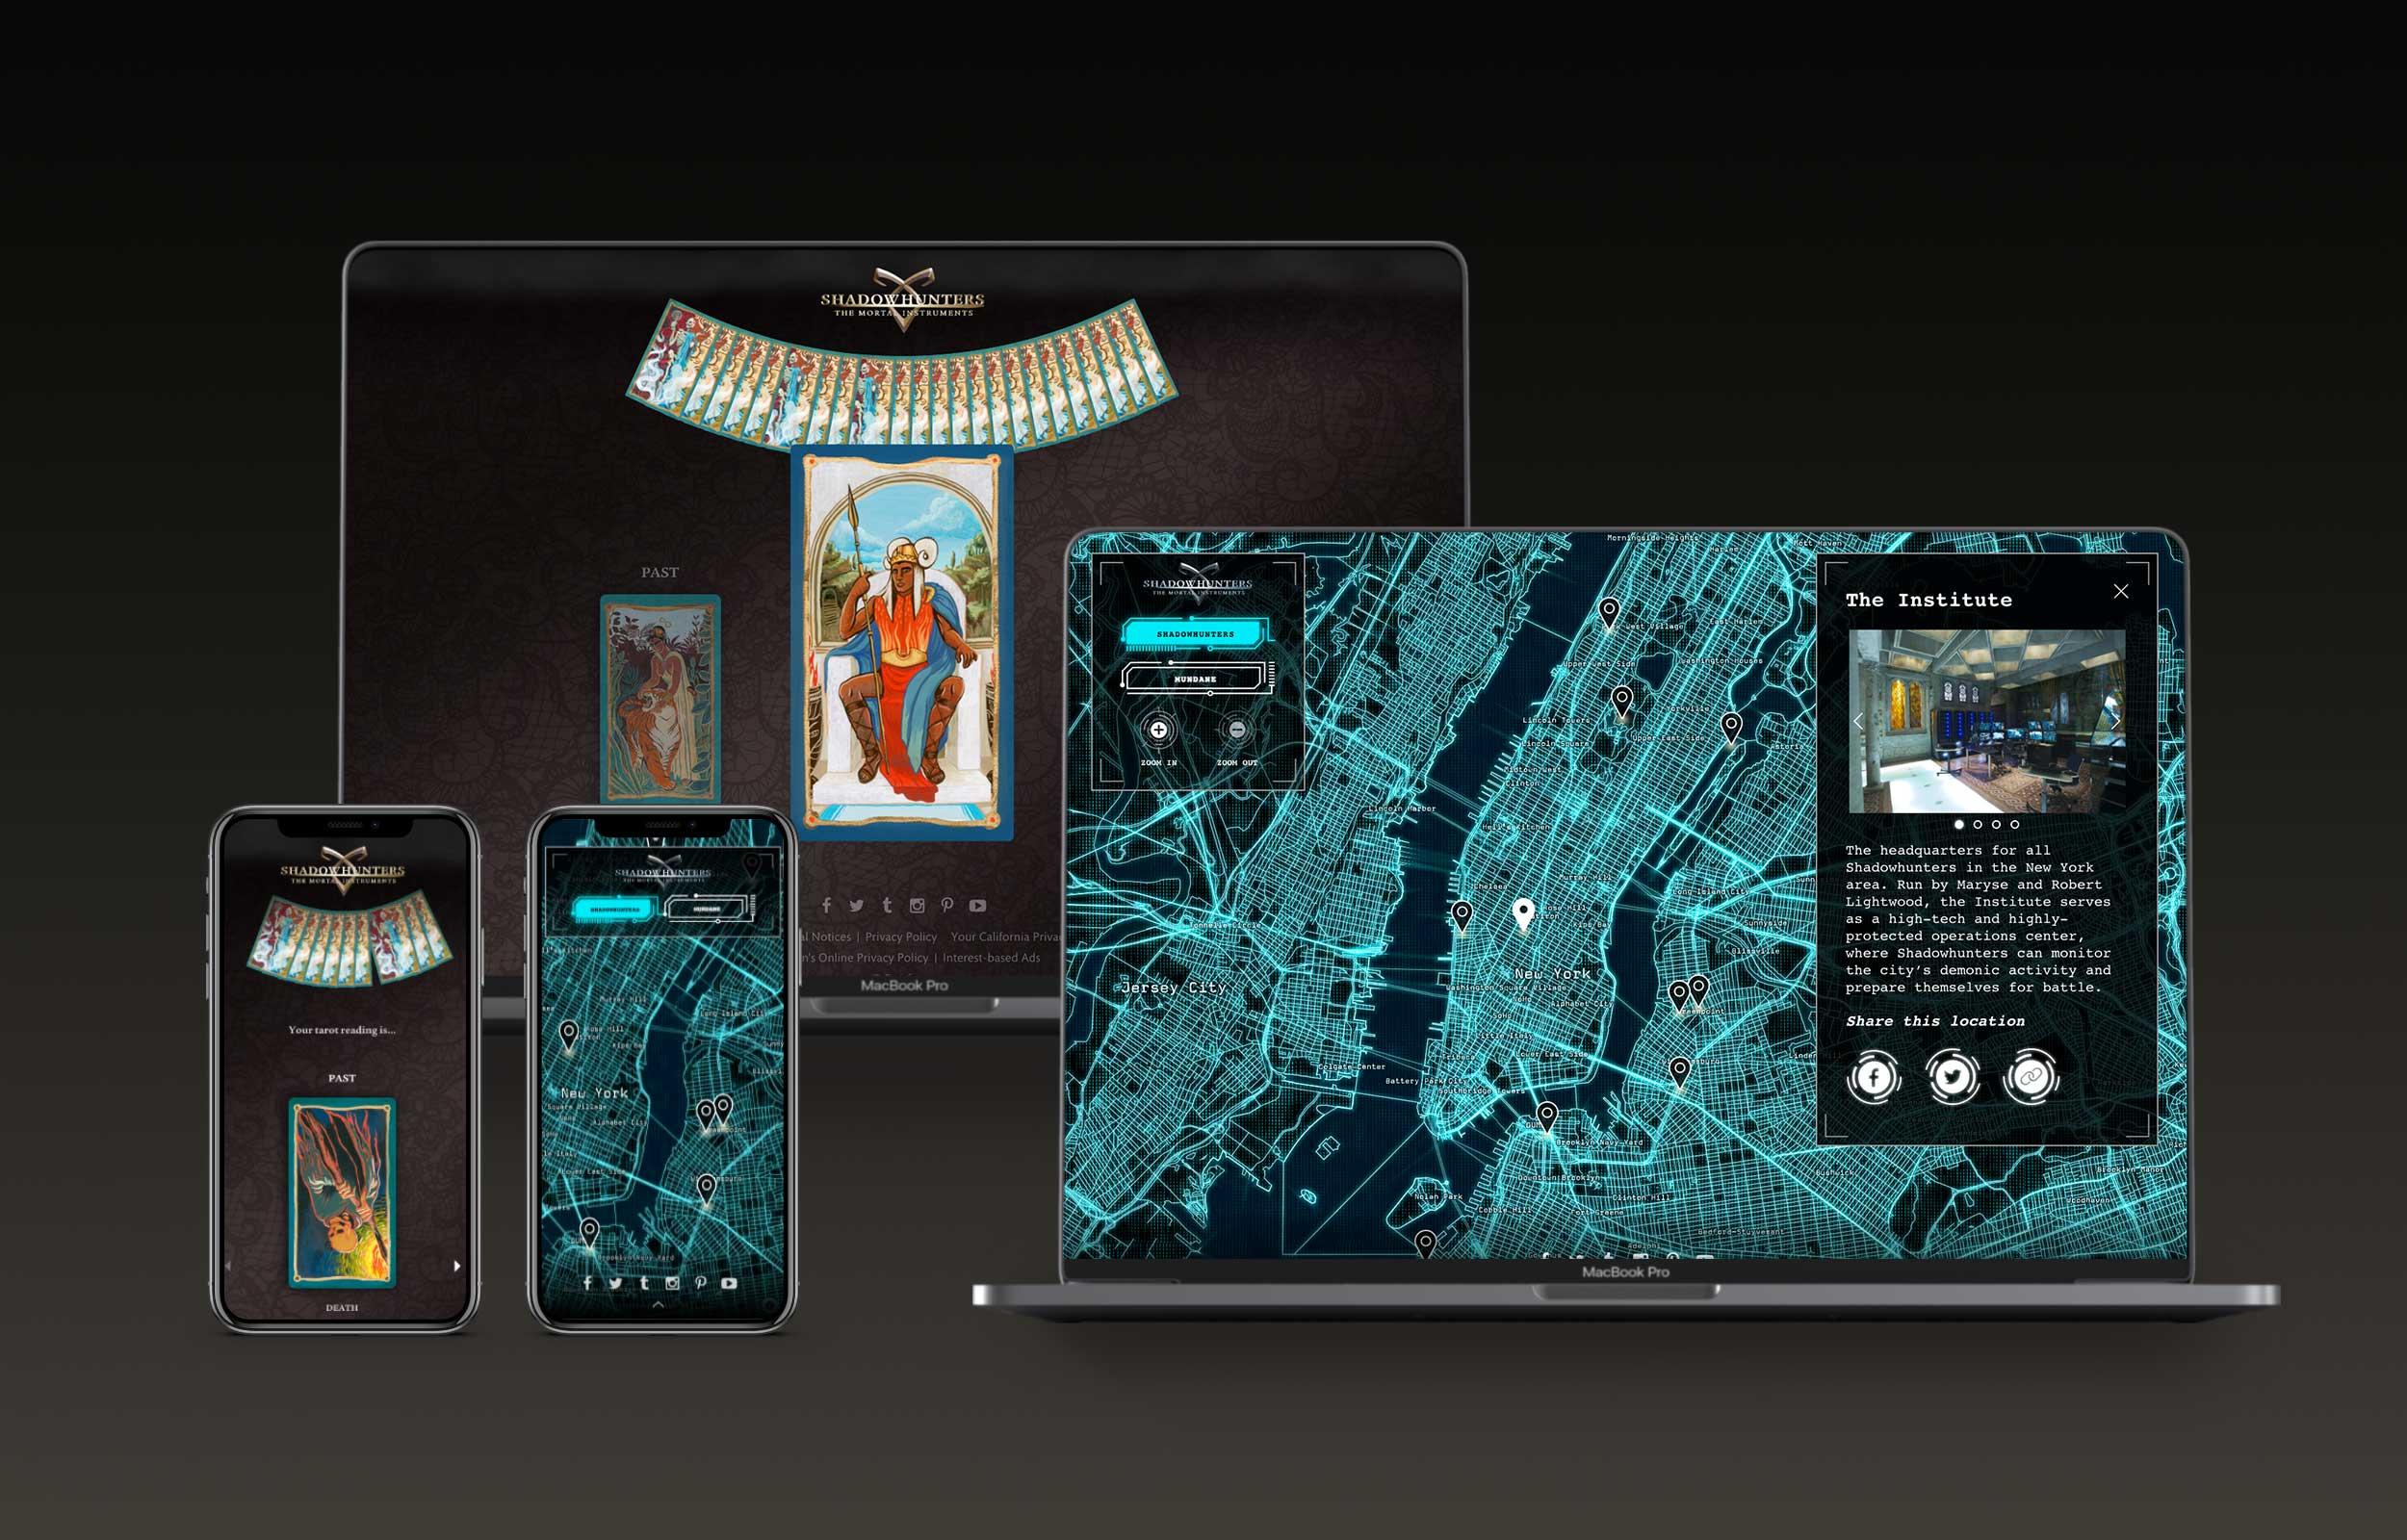 SHS-devices-thumbnail-1600.jpg